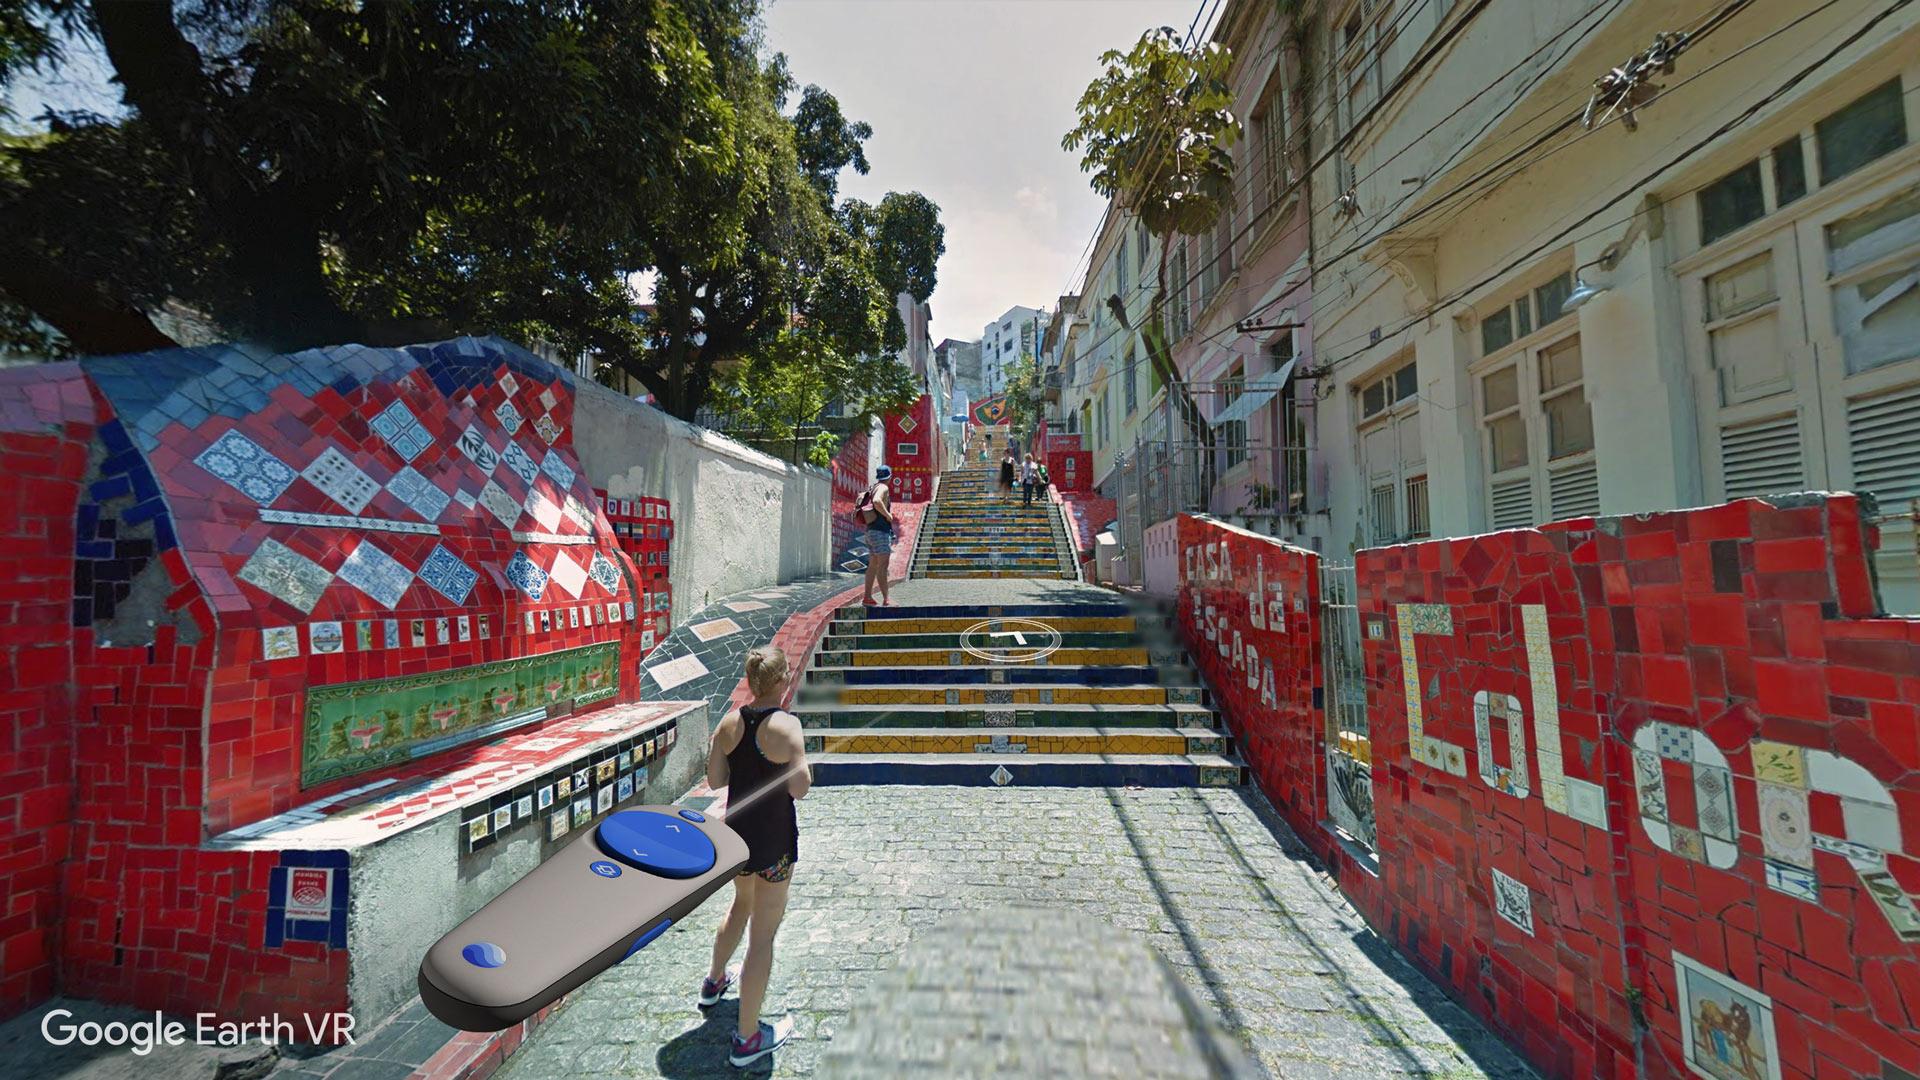 google-earth-vr-street-view (1).jpg